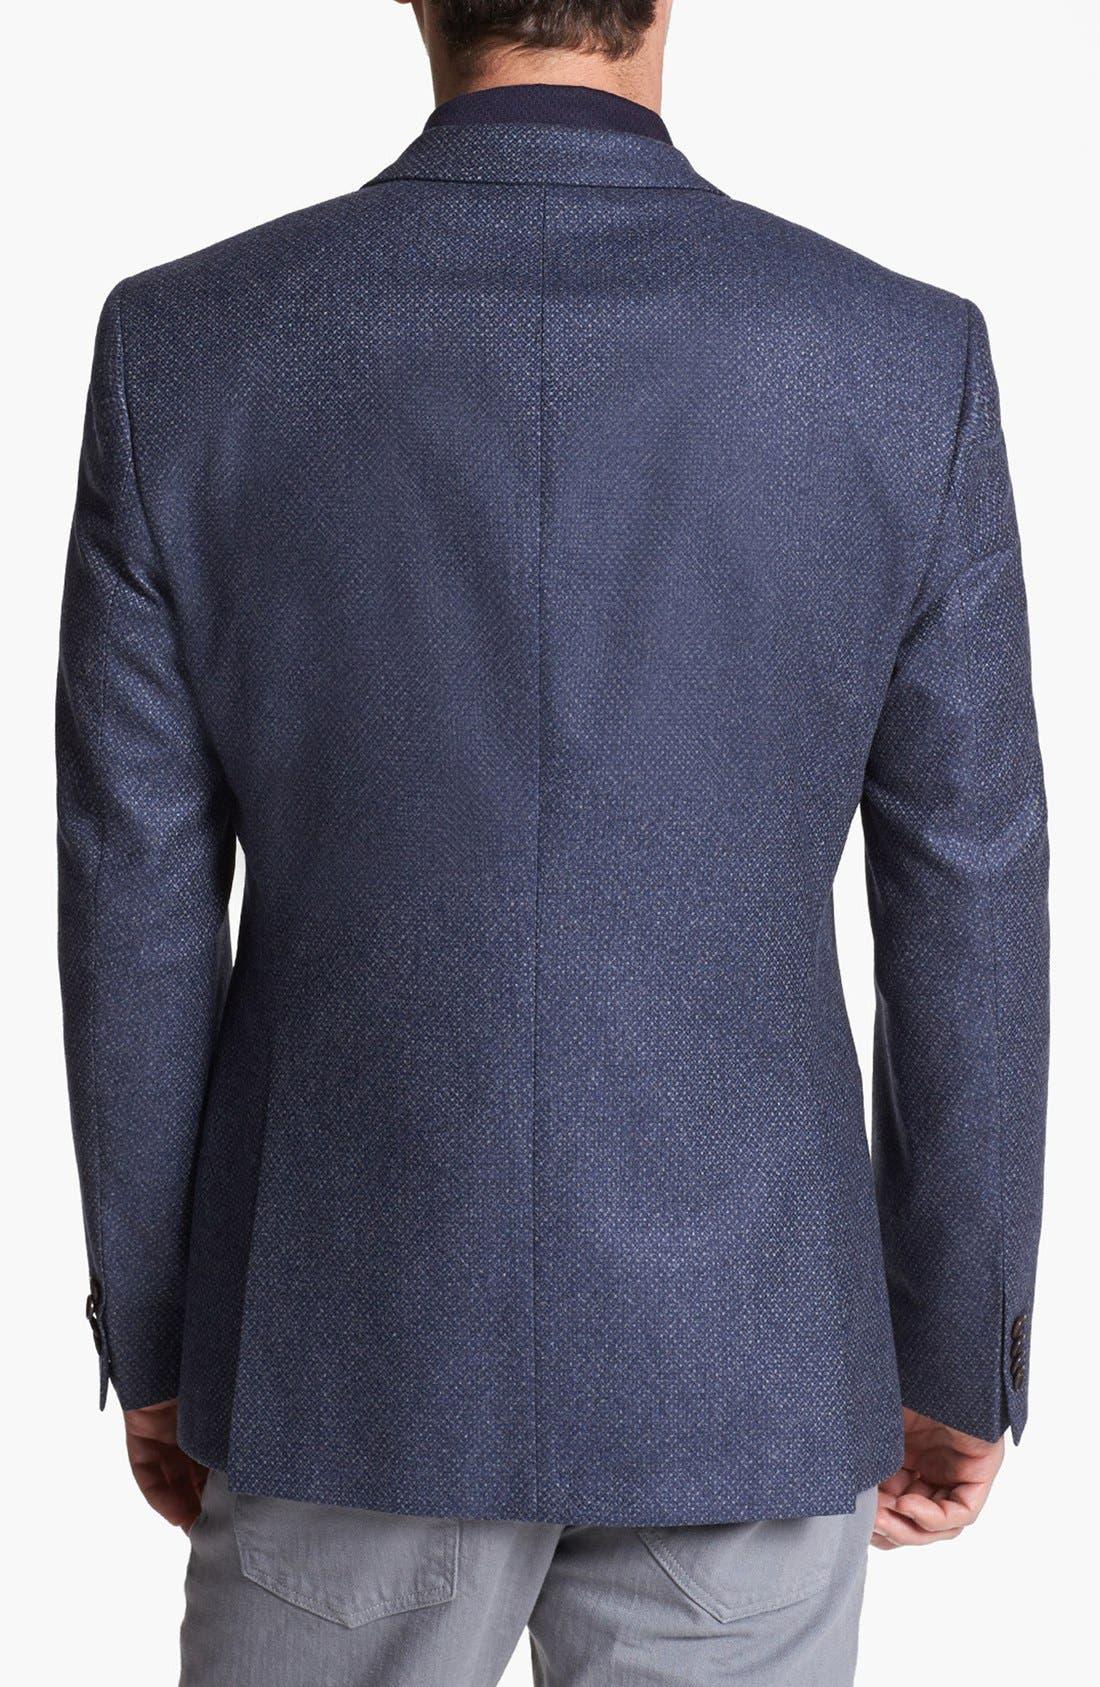 Alternate Image 3  - BOSS HUGO BOSS 'Hutch' Trim Fit Sportcoat